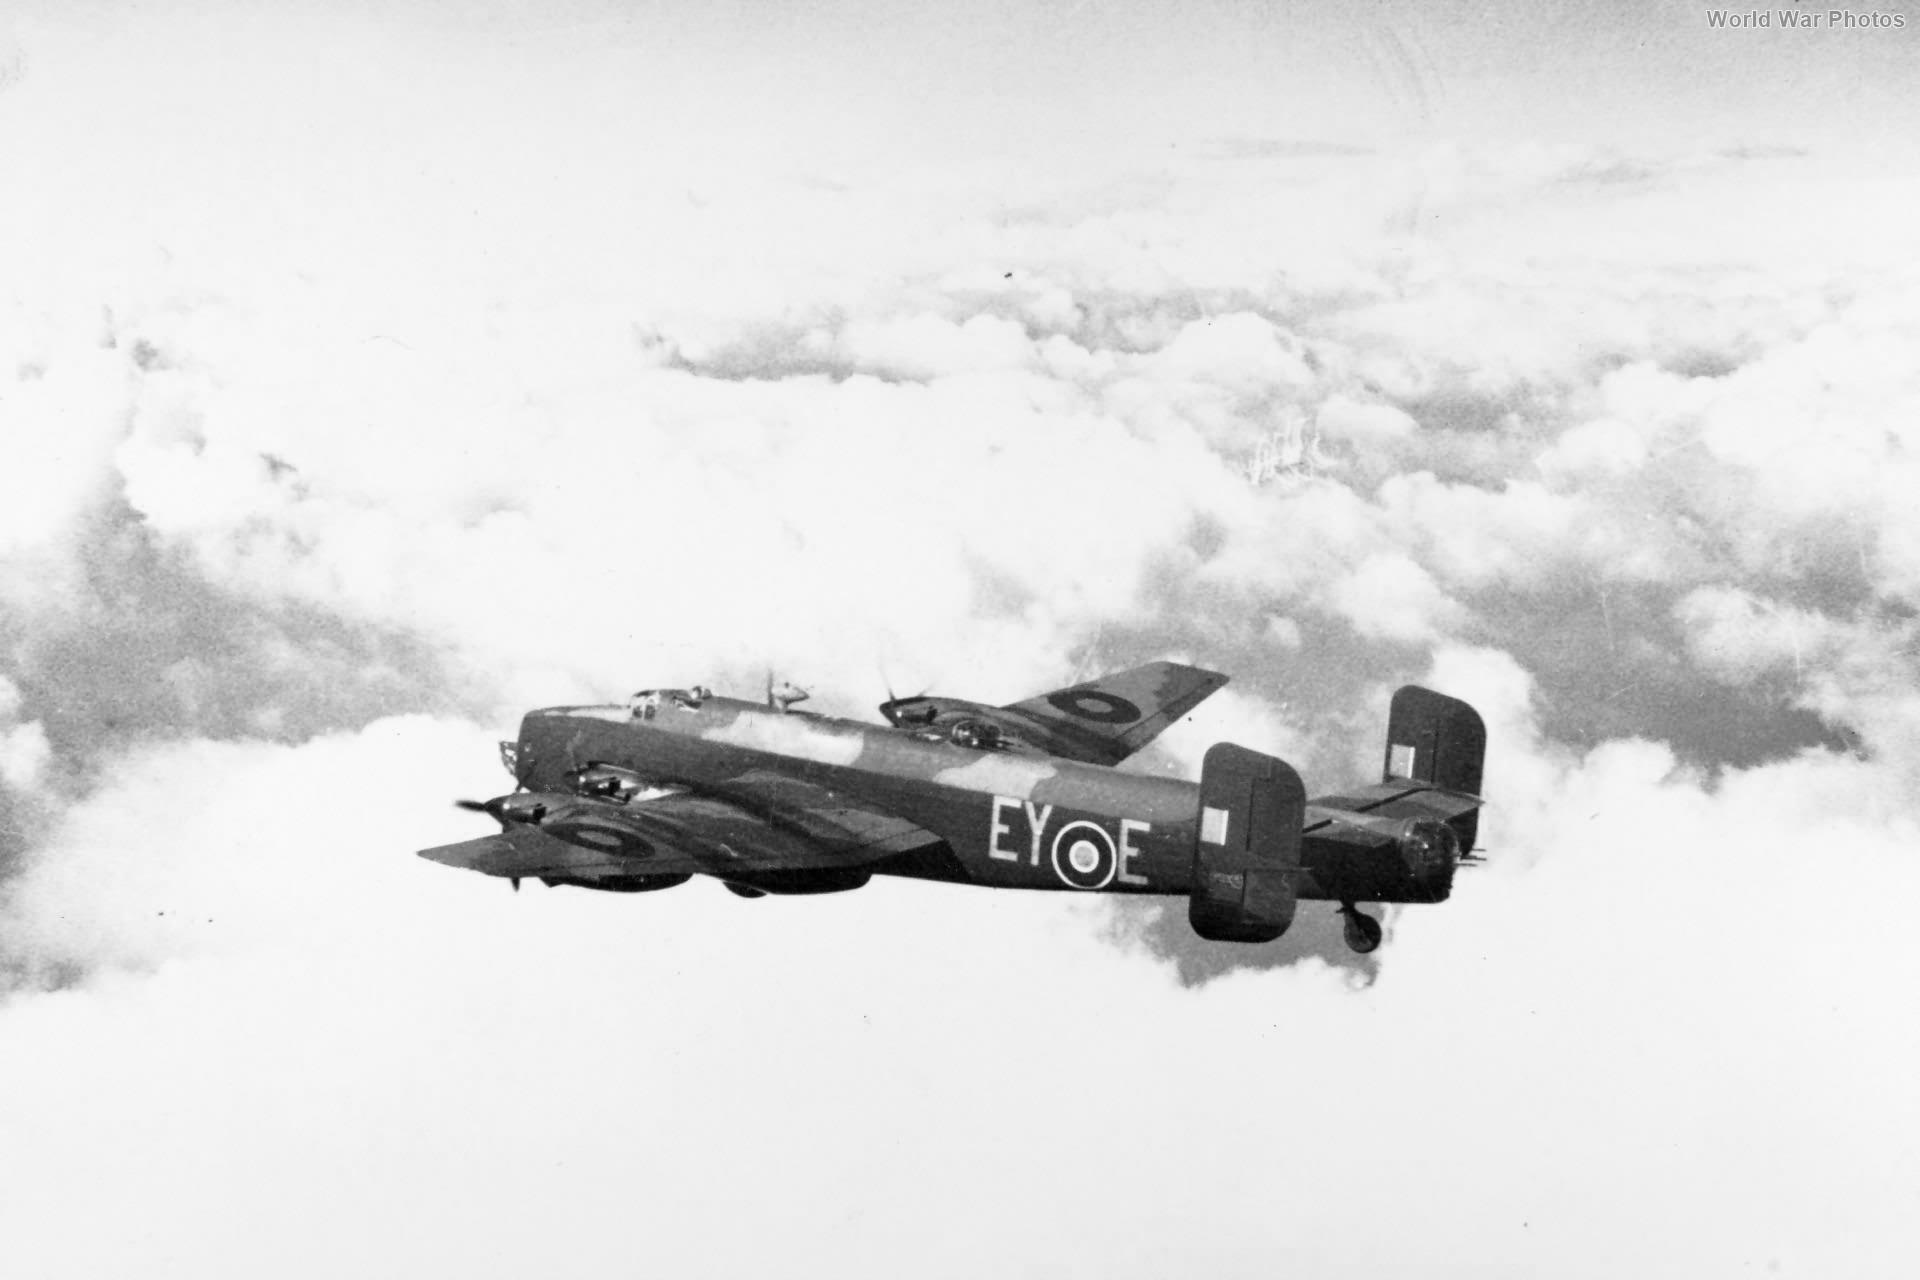 Halifax B Mk II Series 1A LW263 EY-E 78 Sn